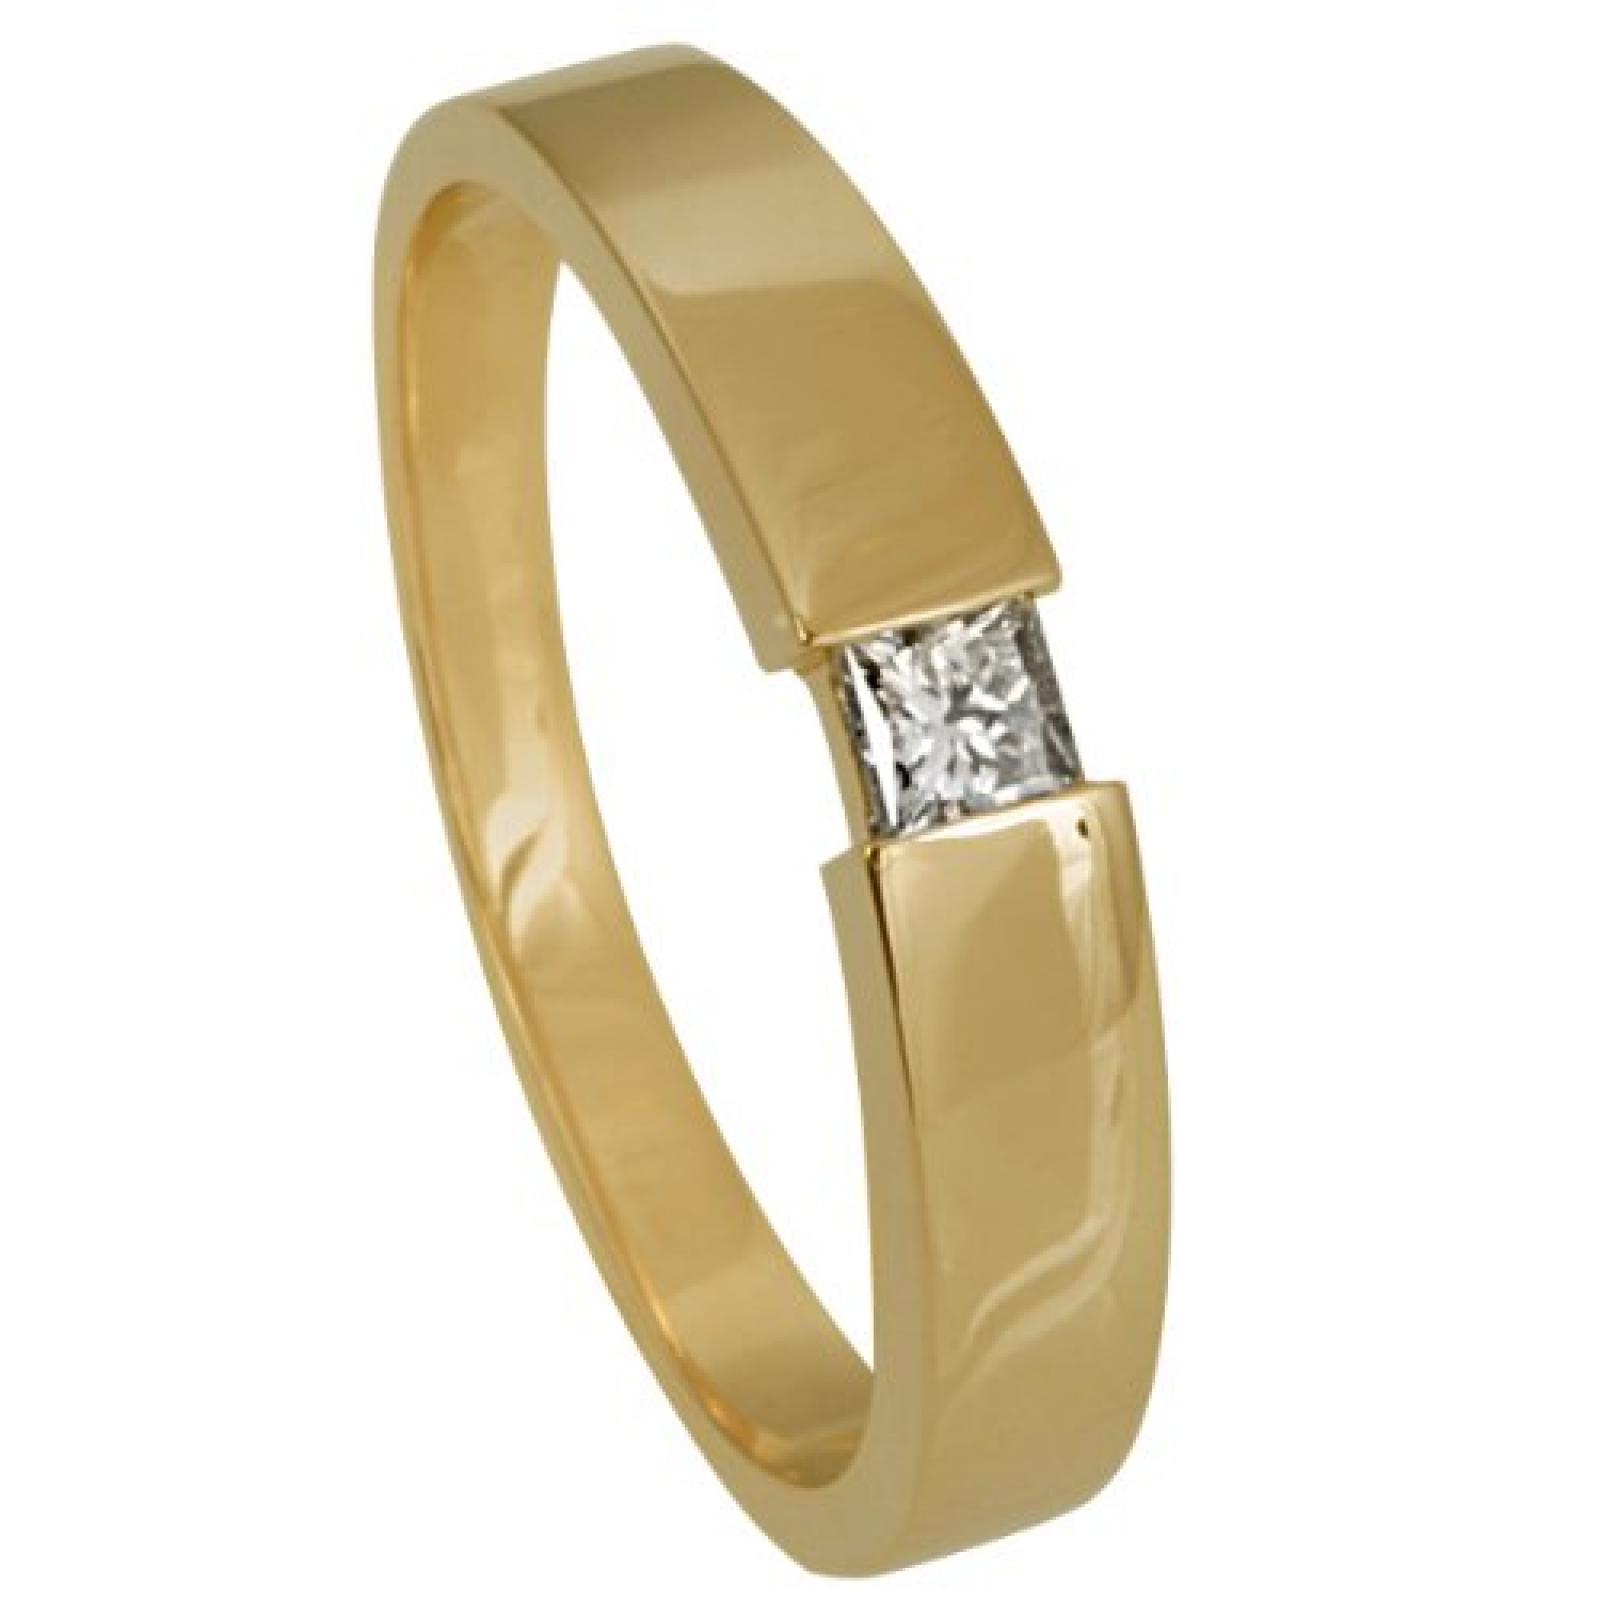 Bella Donna Damen-Ring 585 Gelbgold 1 Diamant Princess 0.15 ct.